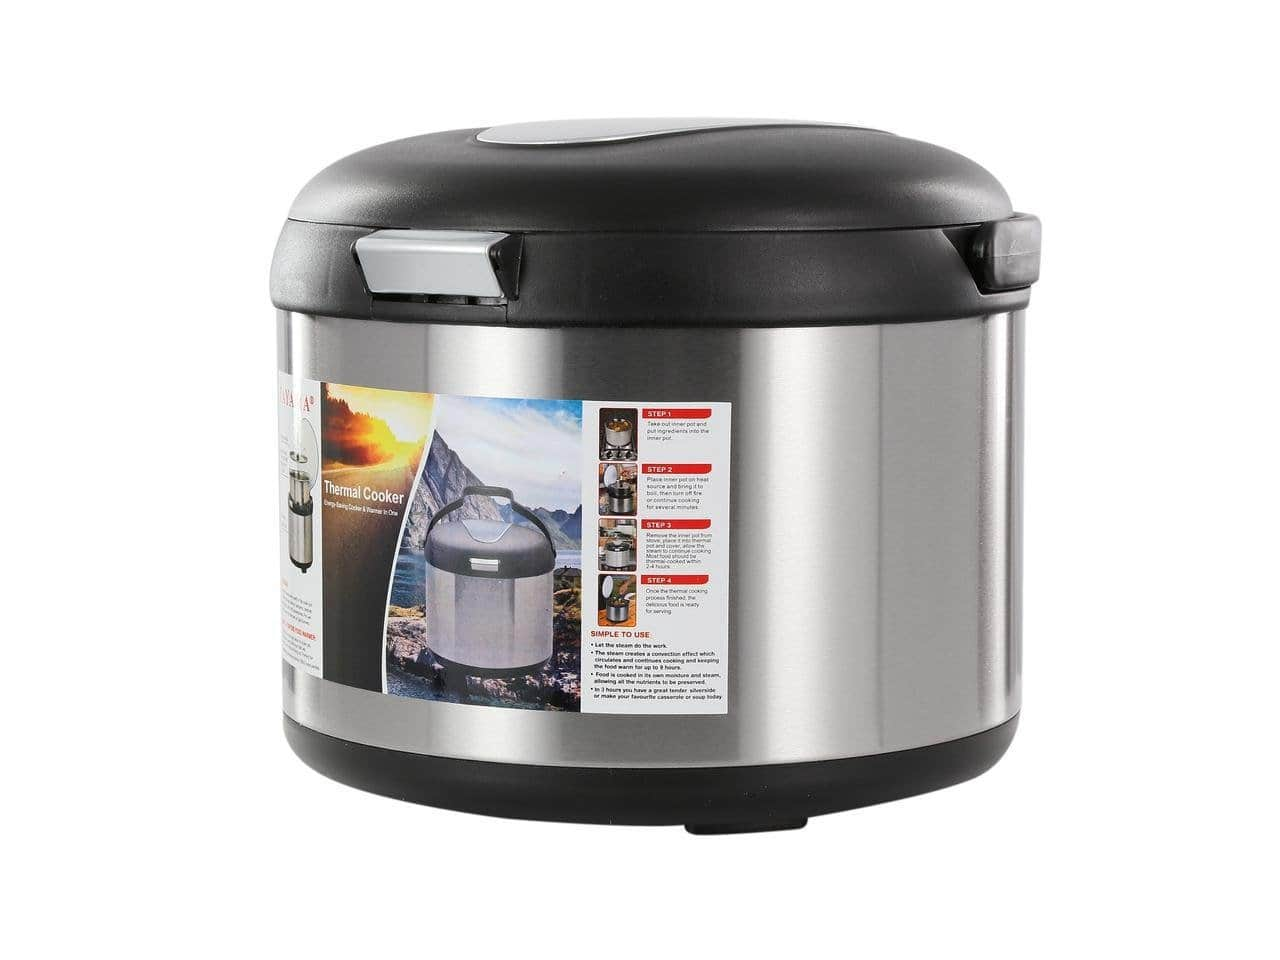 Tayama TXM-50CF Energy-Saving Thermal Cooker, 5 L, Black $37.50 + FS